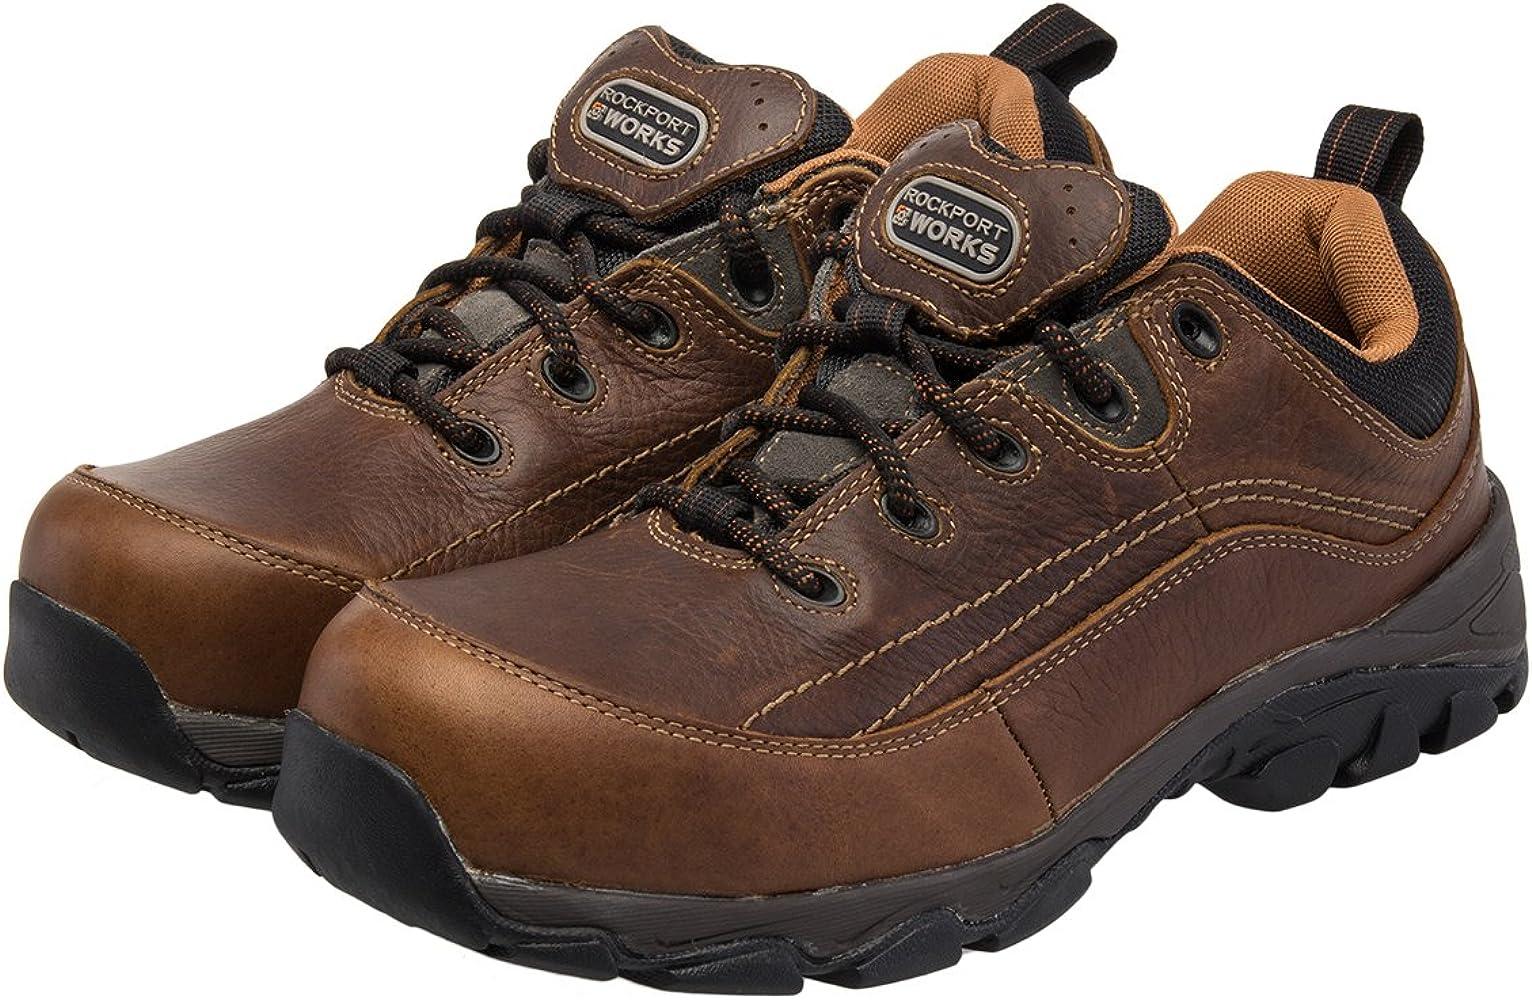 Rockport Work Men's RK6100 Work Shoe